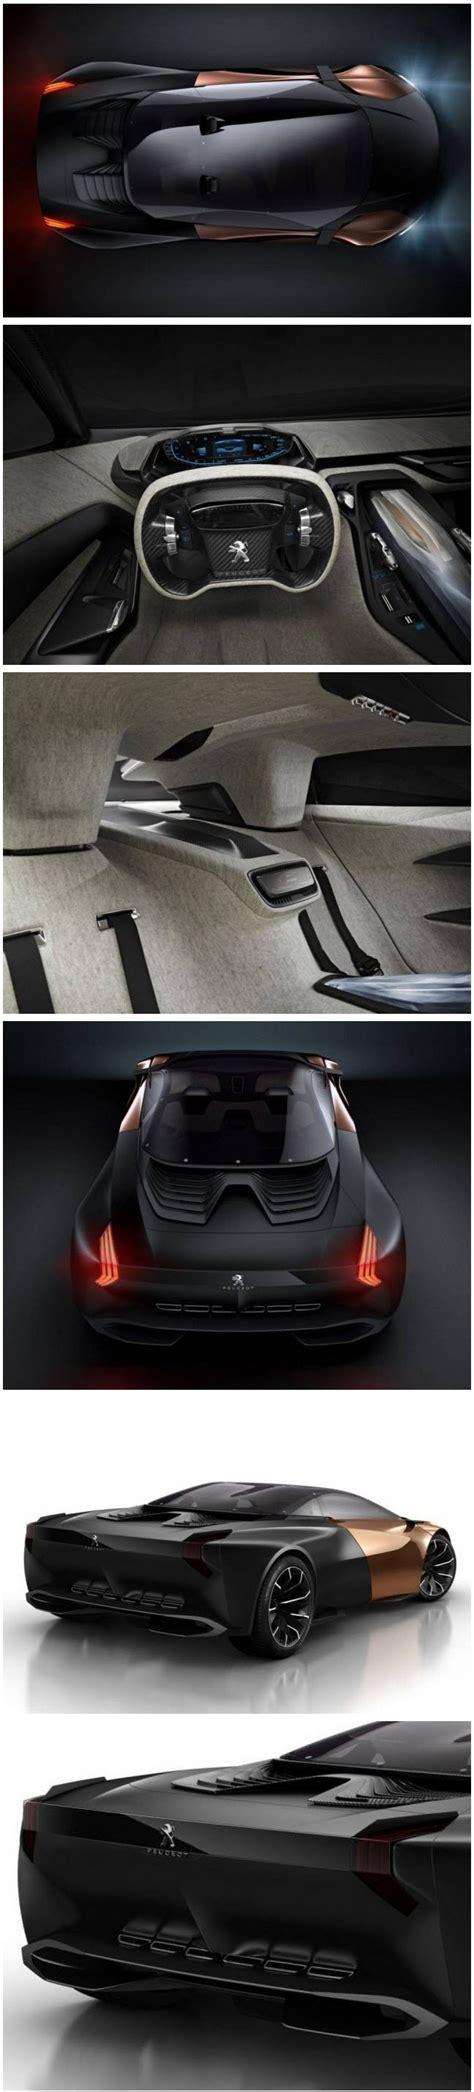 are peugeot good cars 17 best ideas about peugeot on pinterest concept cars